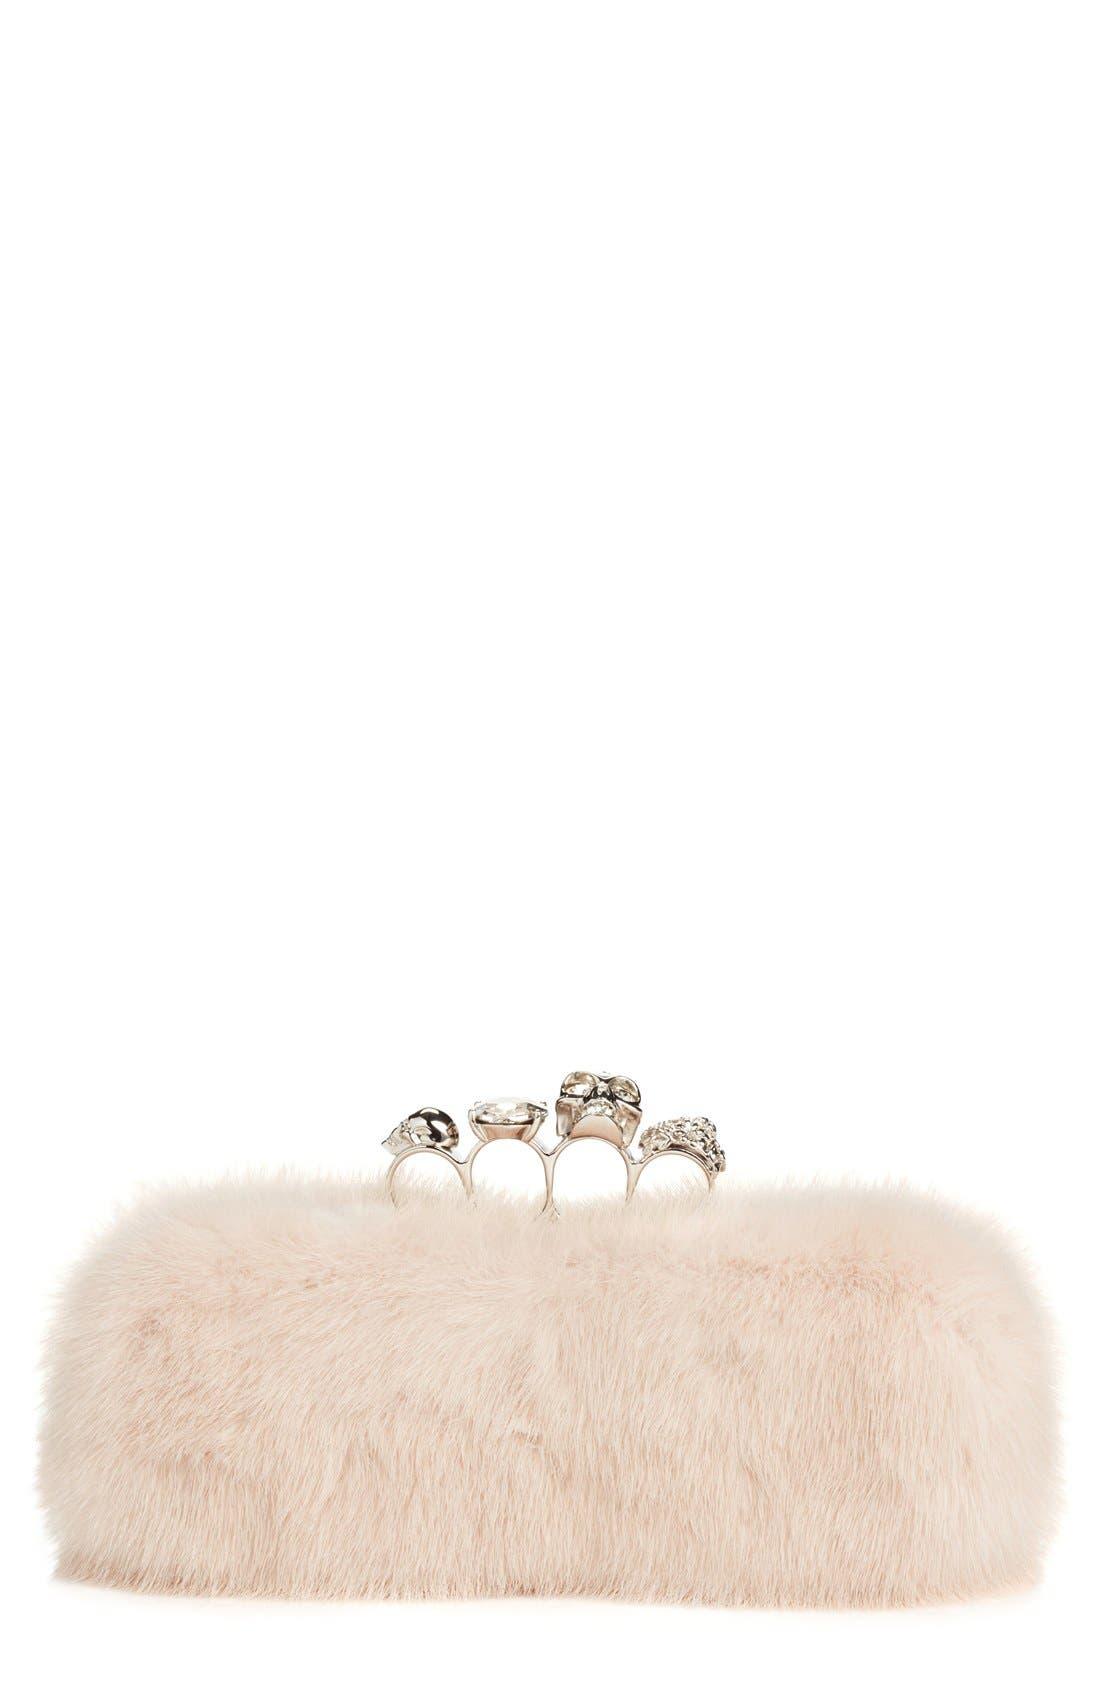 Alternate Image 1 Selected - Alexander McQueen Knuckle Clasp Genuine Mink Fur Box Clutch